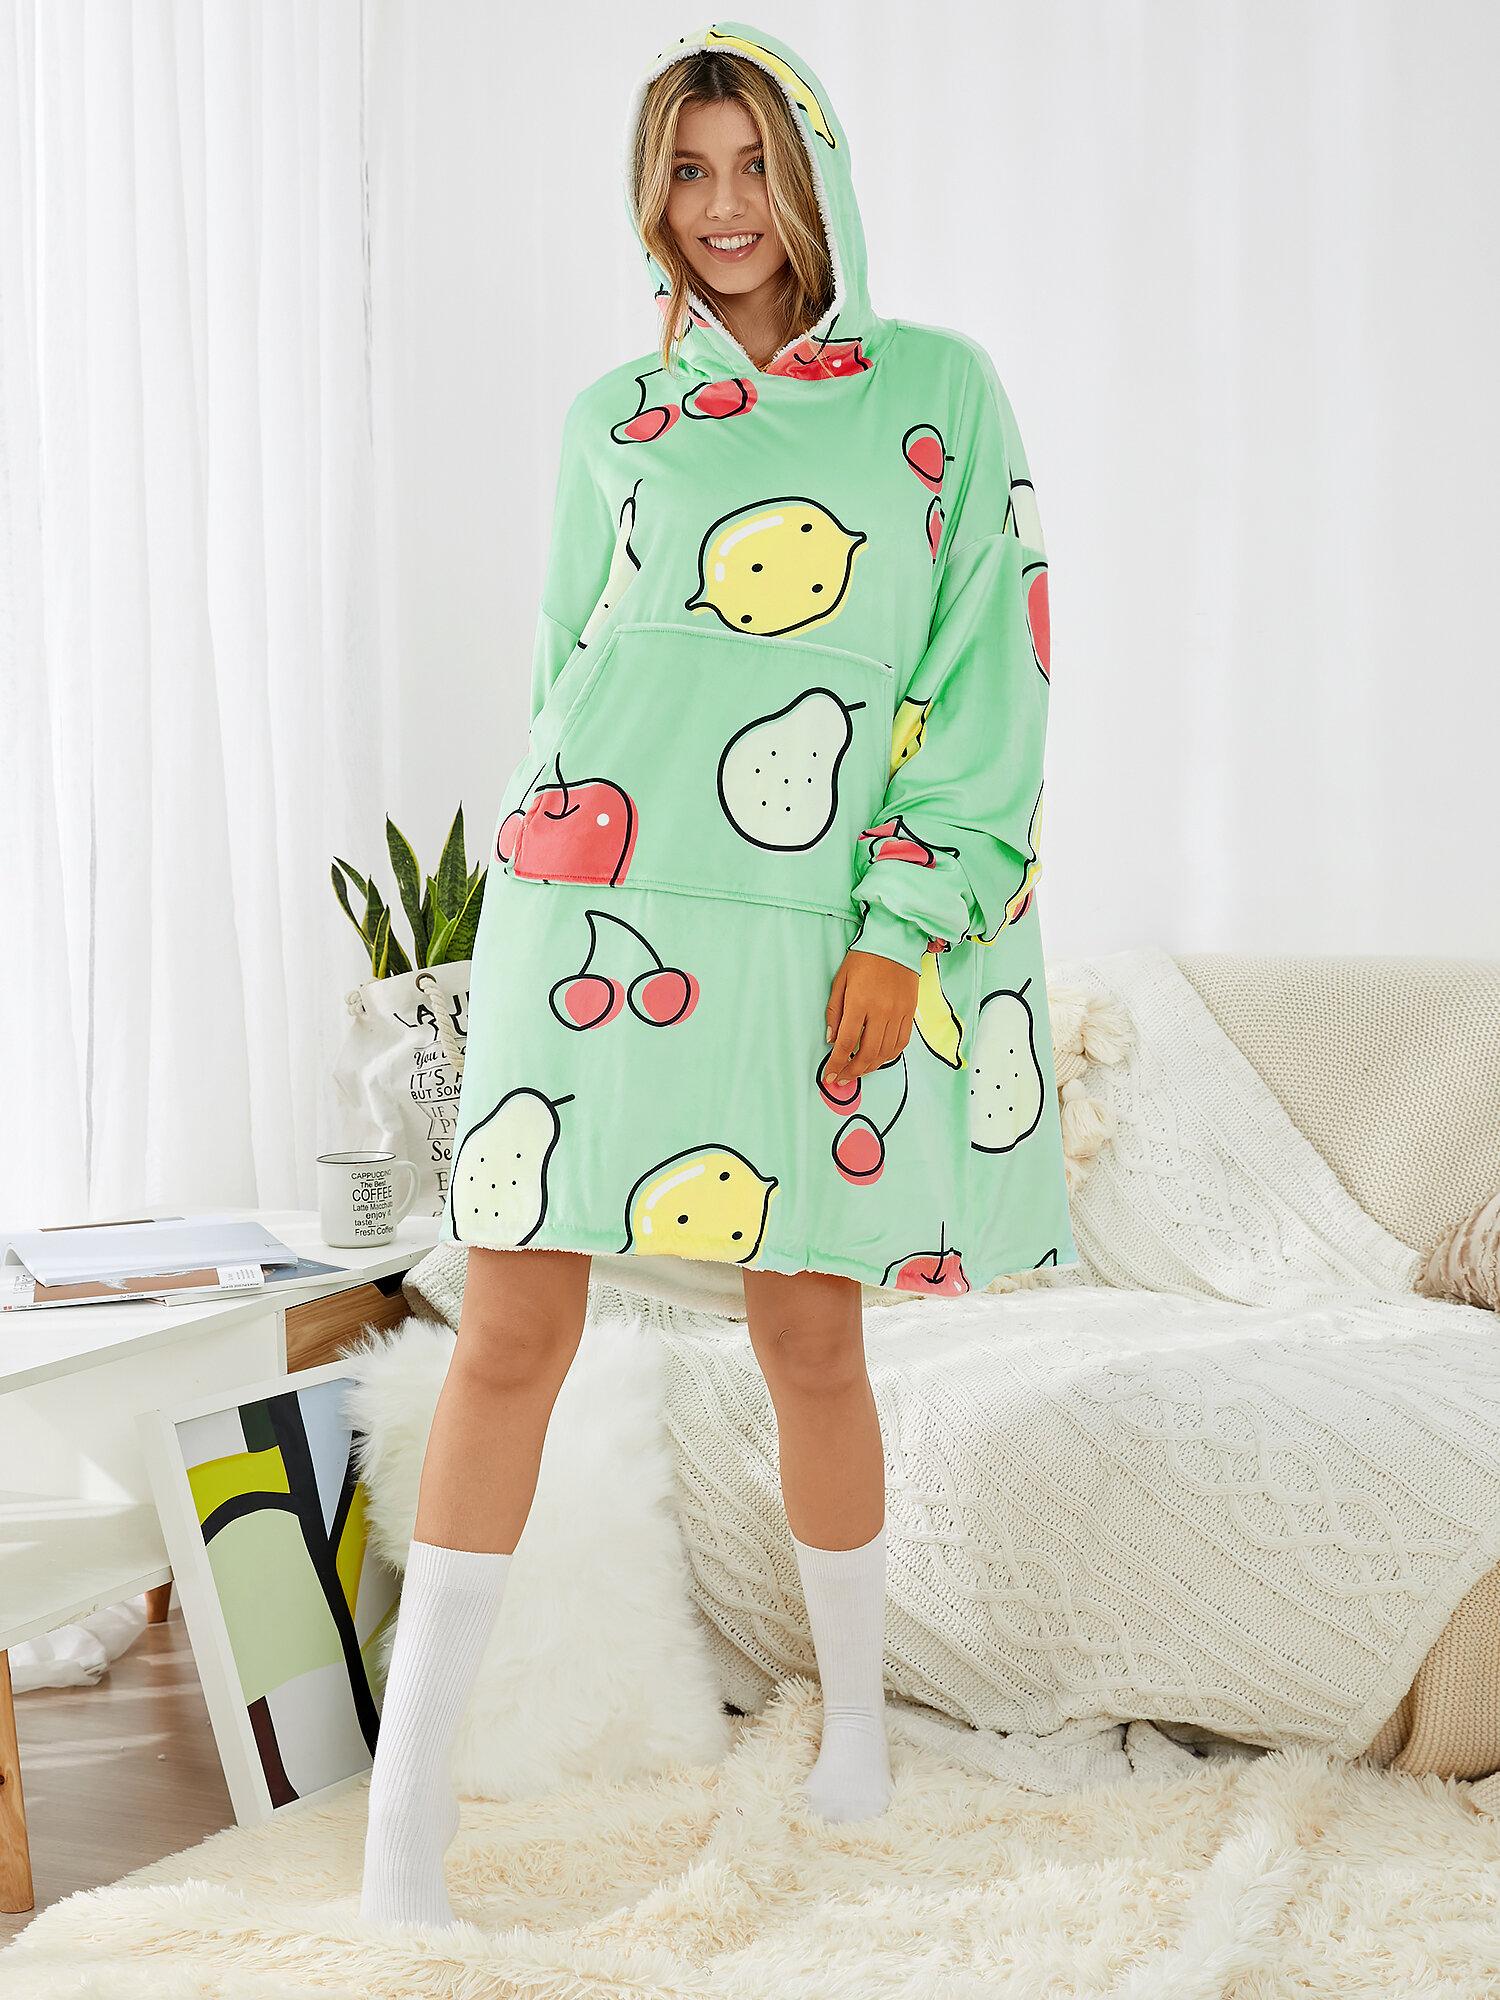 Women Cartoon Fruit Print Thick Sherpa Lined Robe Double-Faced Wearable Blanket Hoodie Oversized Sweatshirt With Kangaroo Pocket